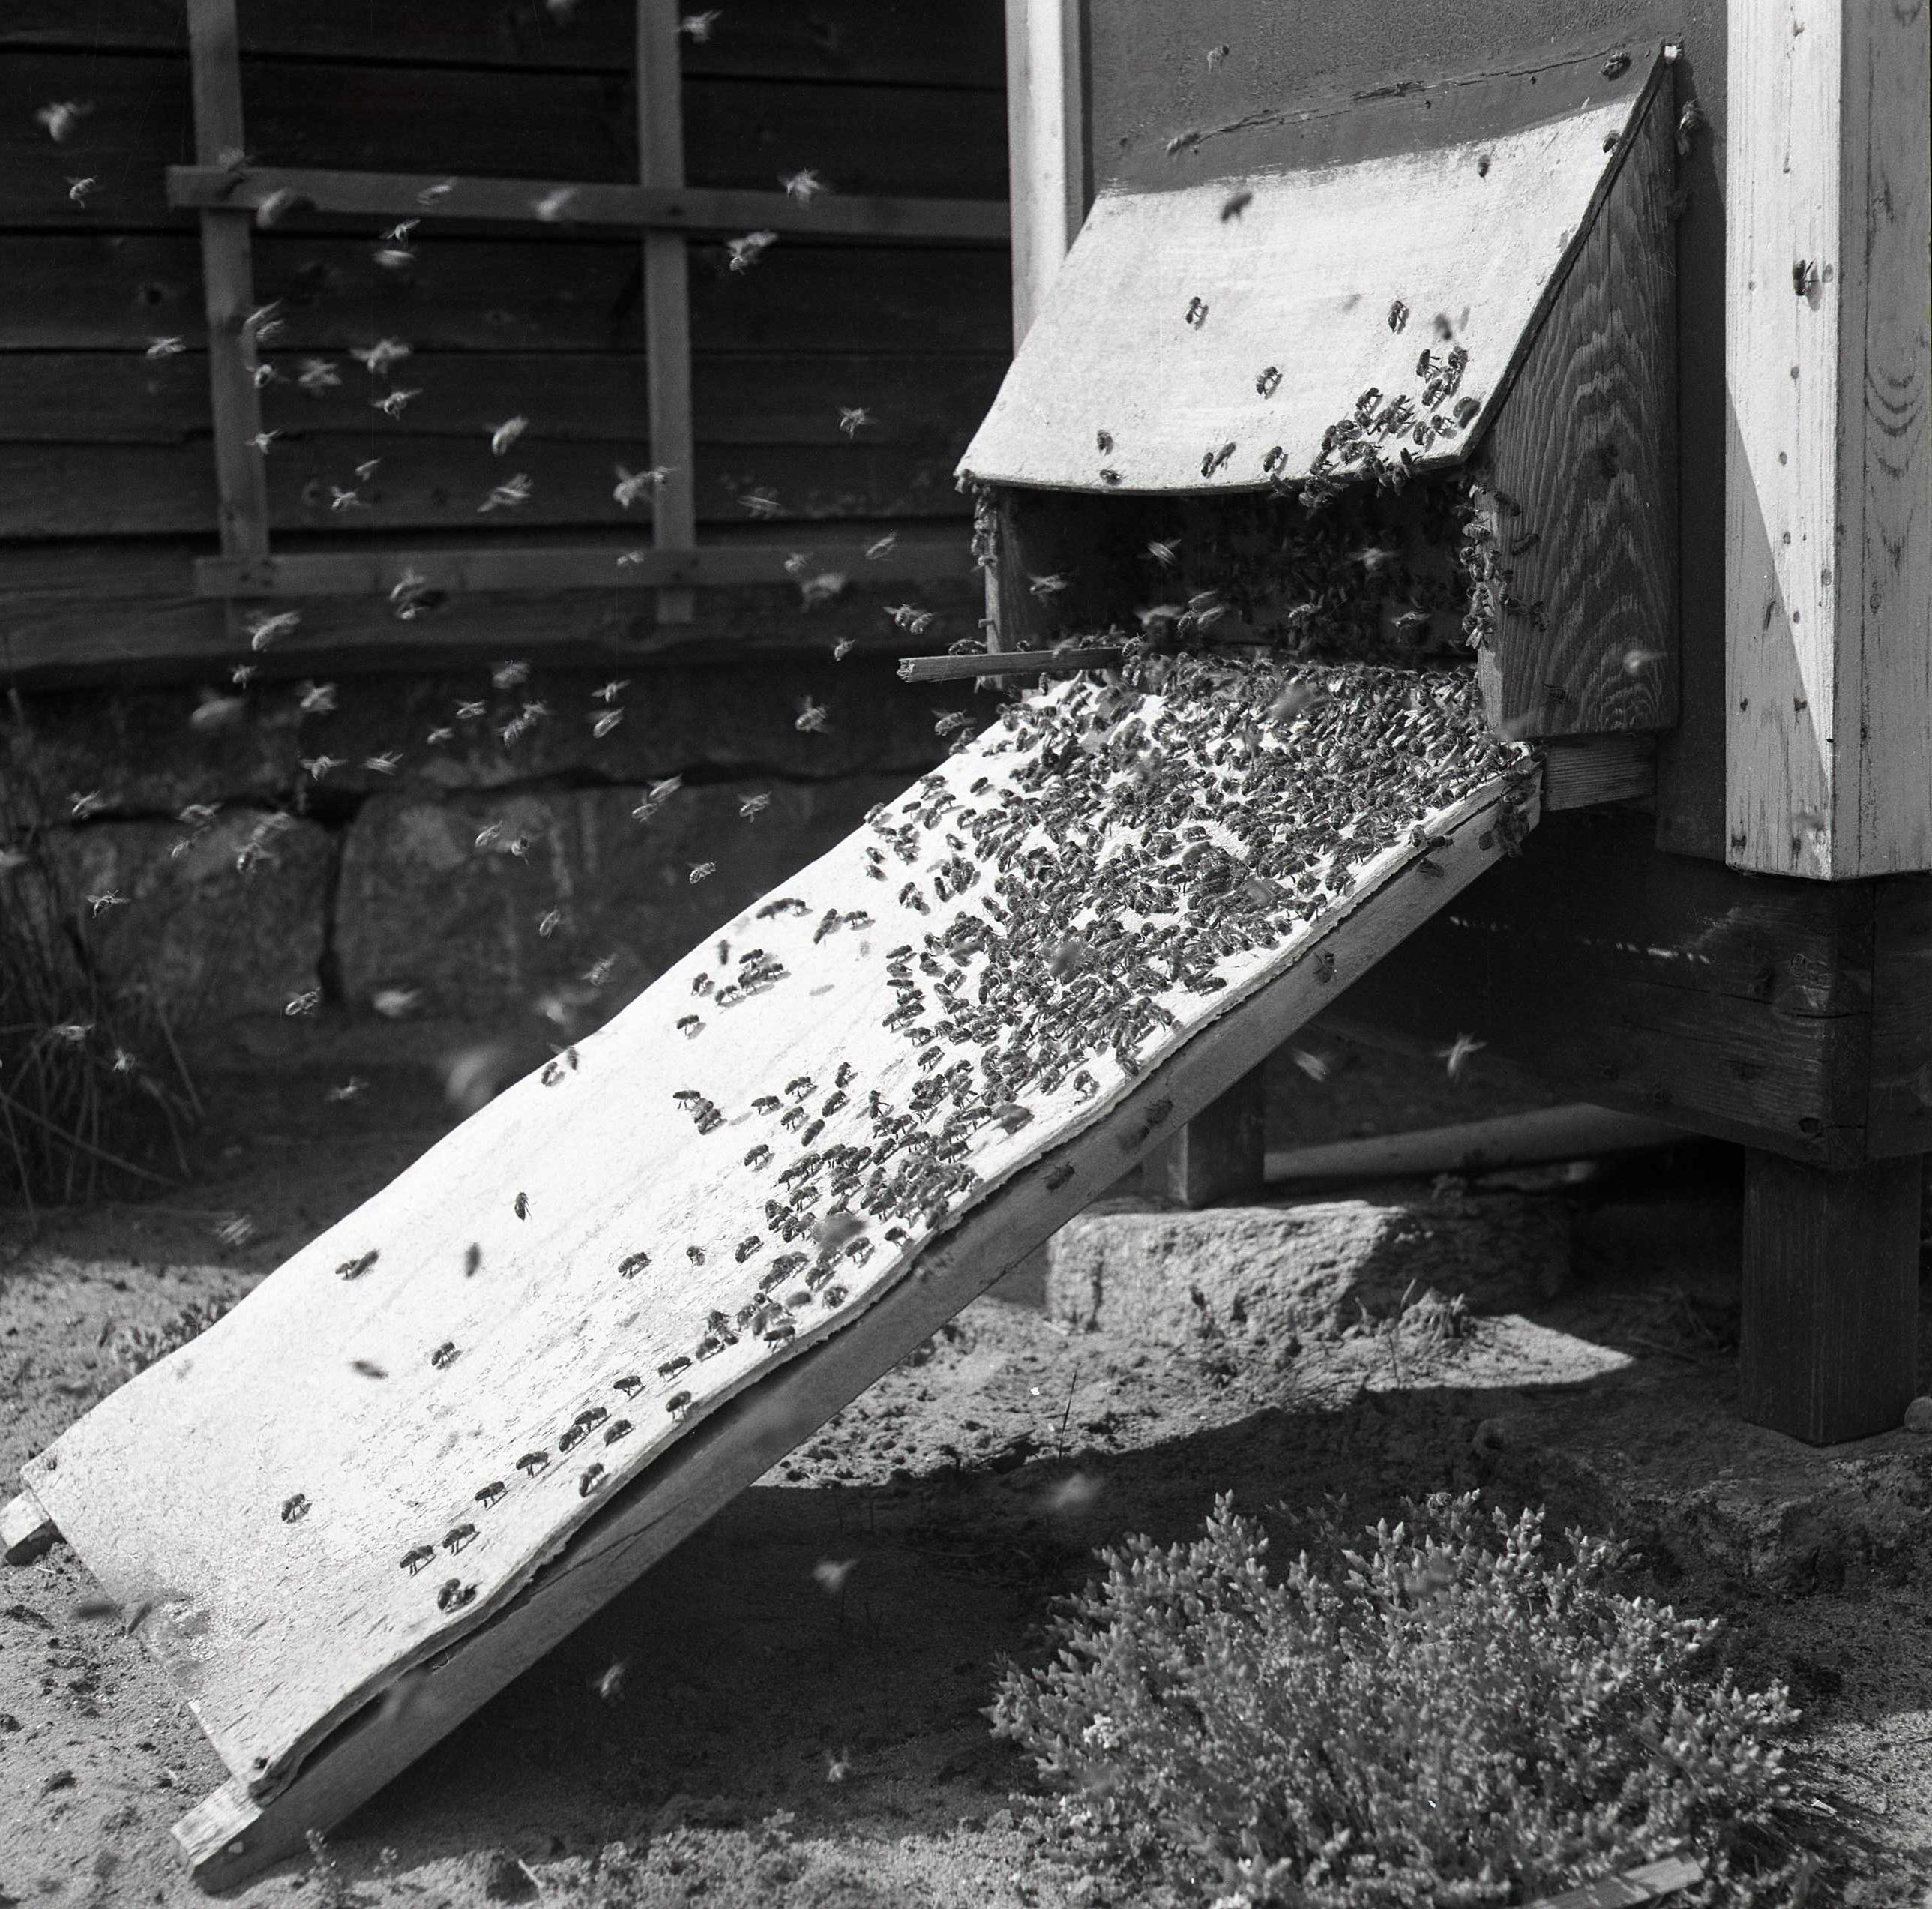 M 115 880: Bisvärm 10 juli 1955. Foto: Hilding Mickelsson©